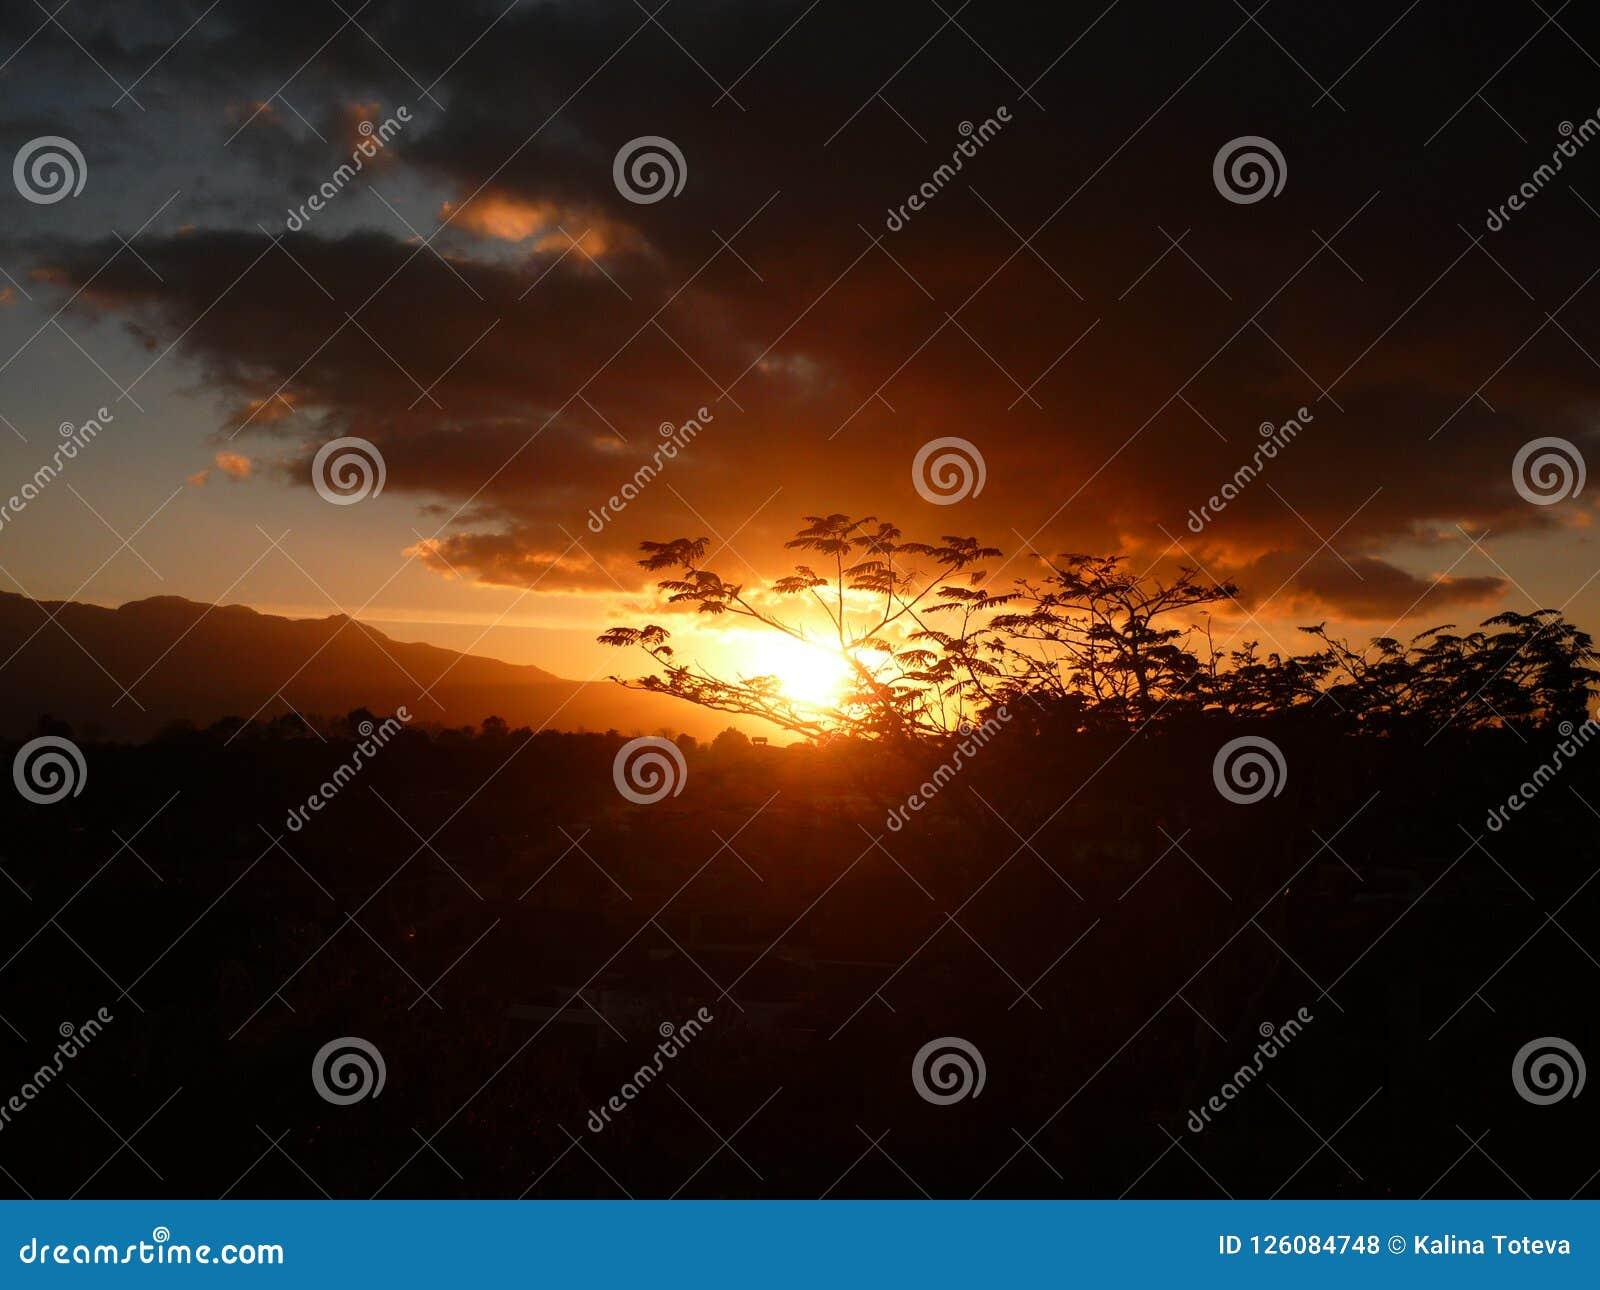 Golden nightfall in the mountains.